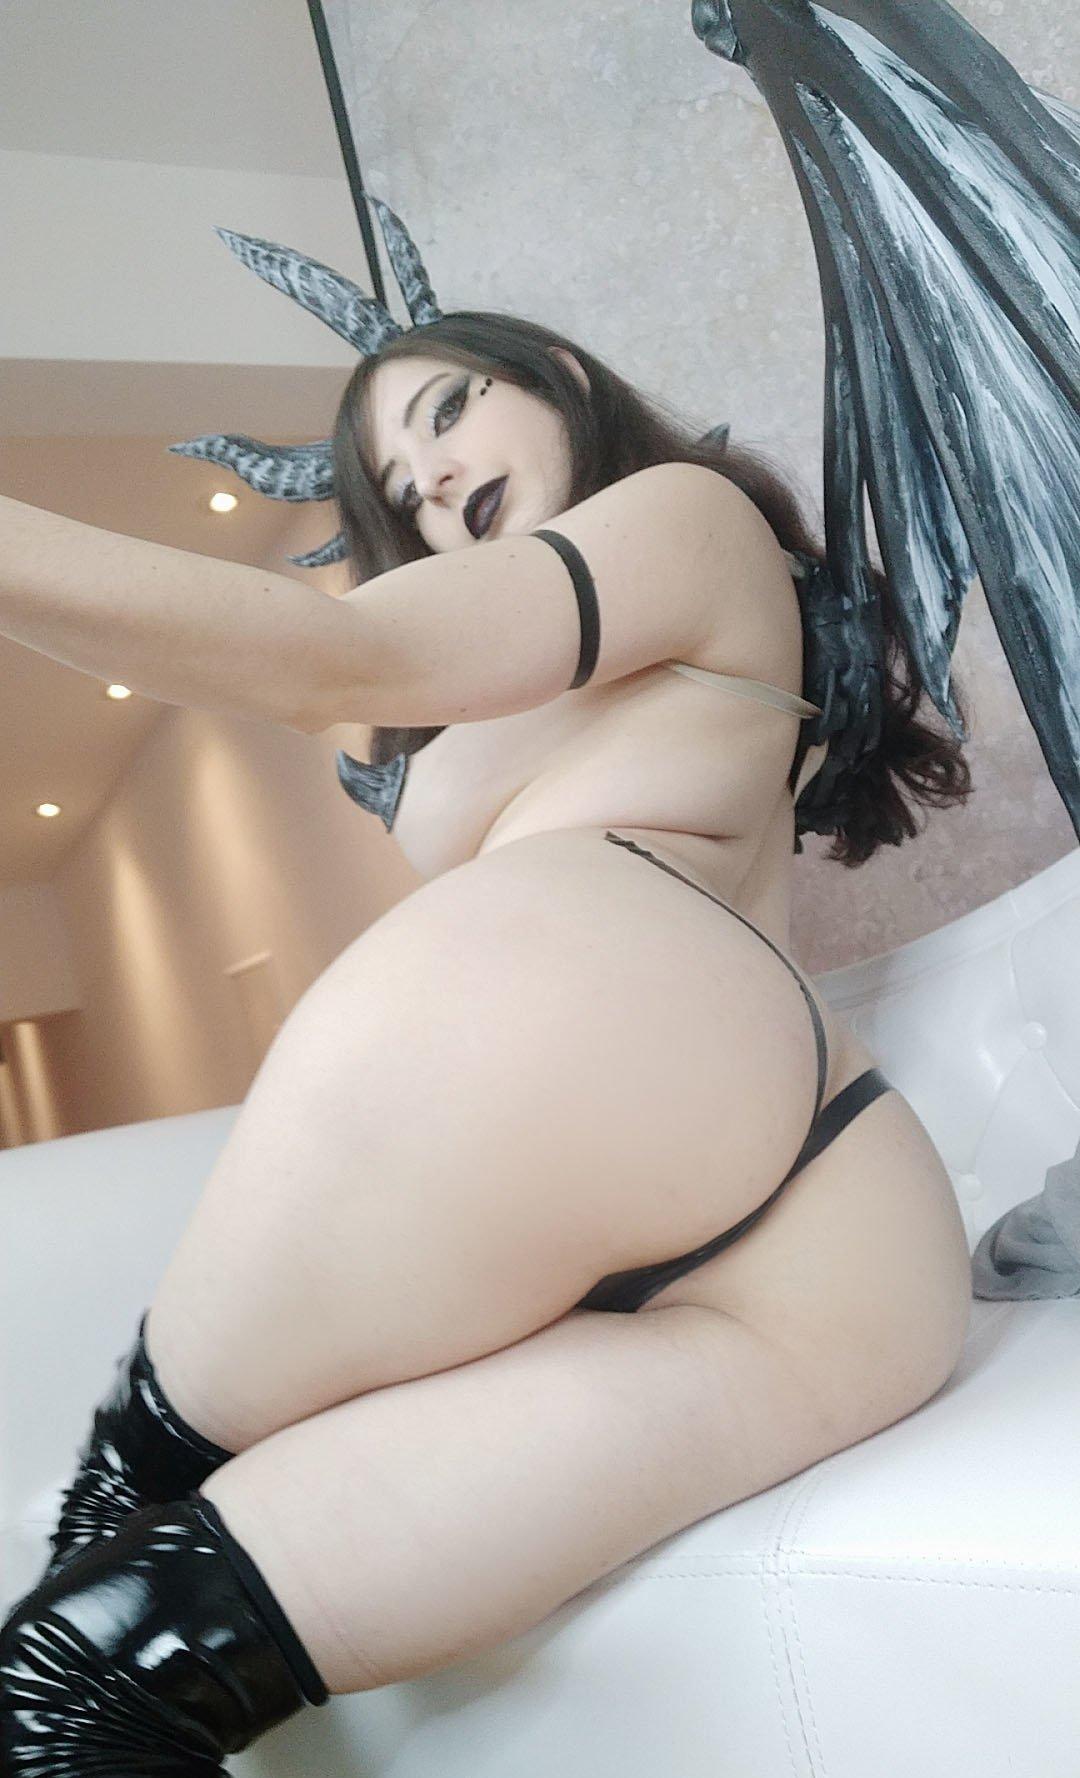 Mikomi Honika Azyth Mikomihokina Patreon Nude Leaks 0033